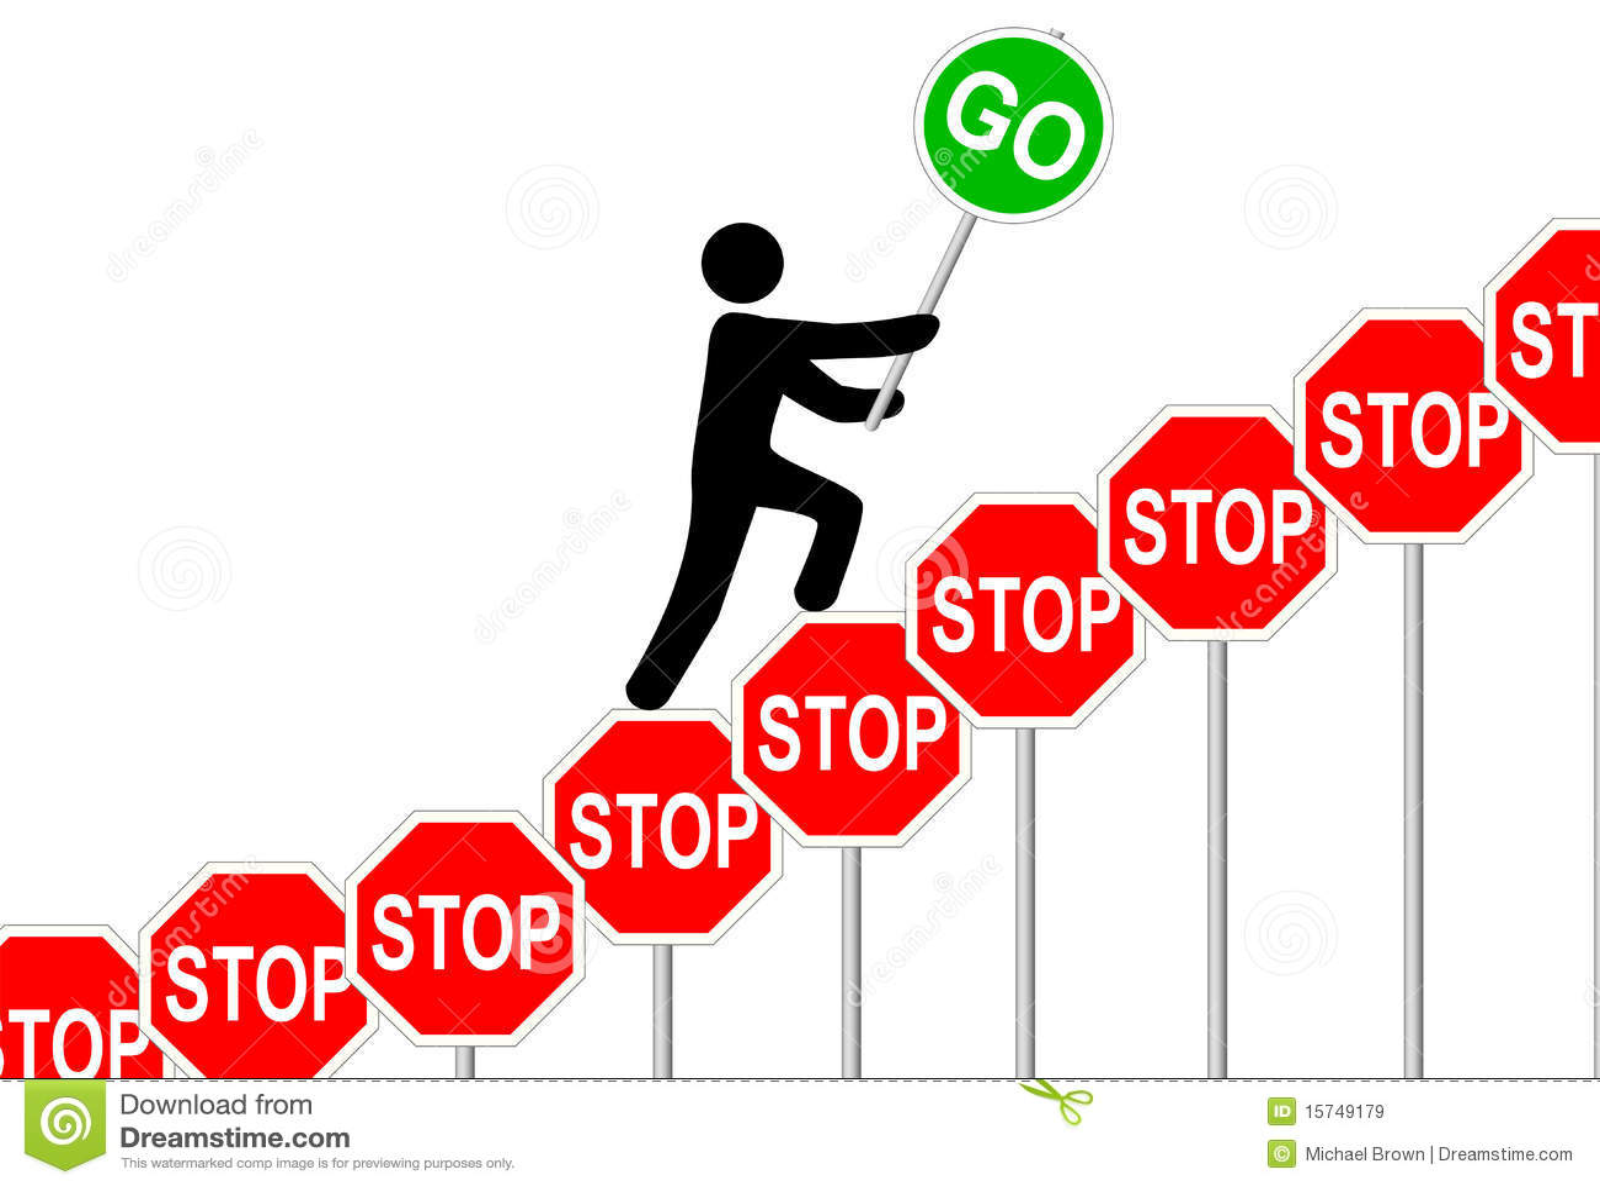 person overcomes stop signs raises go sign stock vector illustration of symbol successful. Black Bedroom Furniture Sets. Home Design Ideas